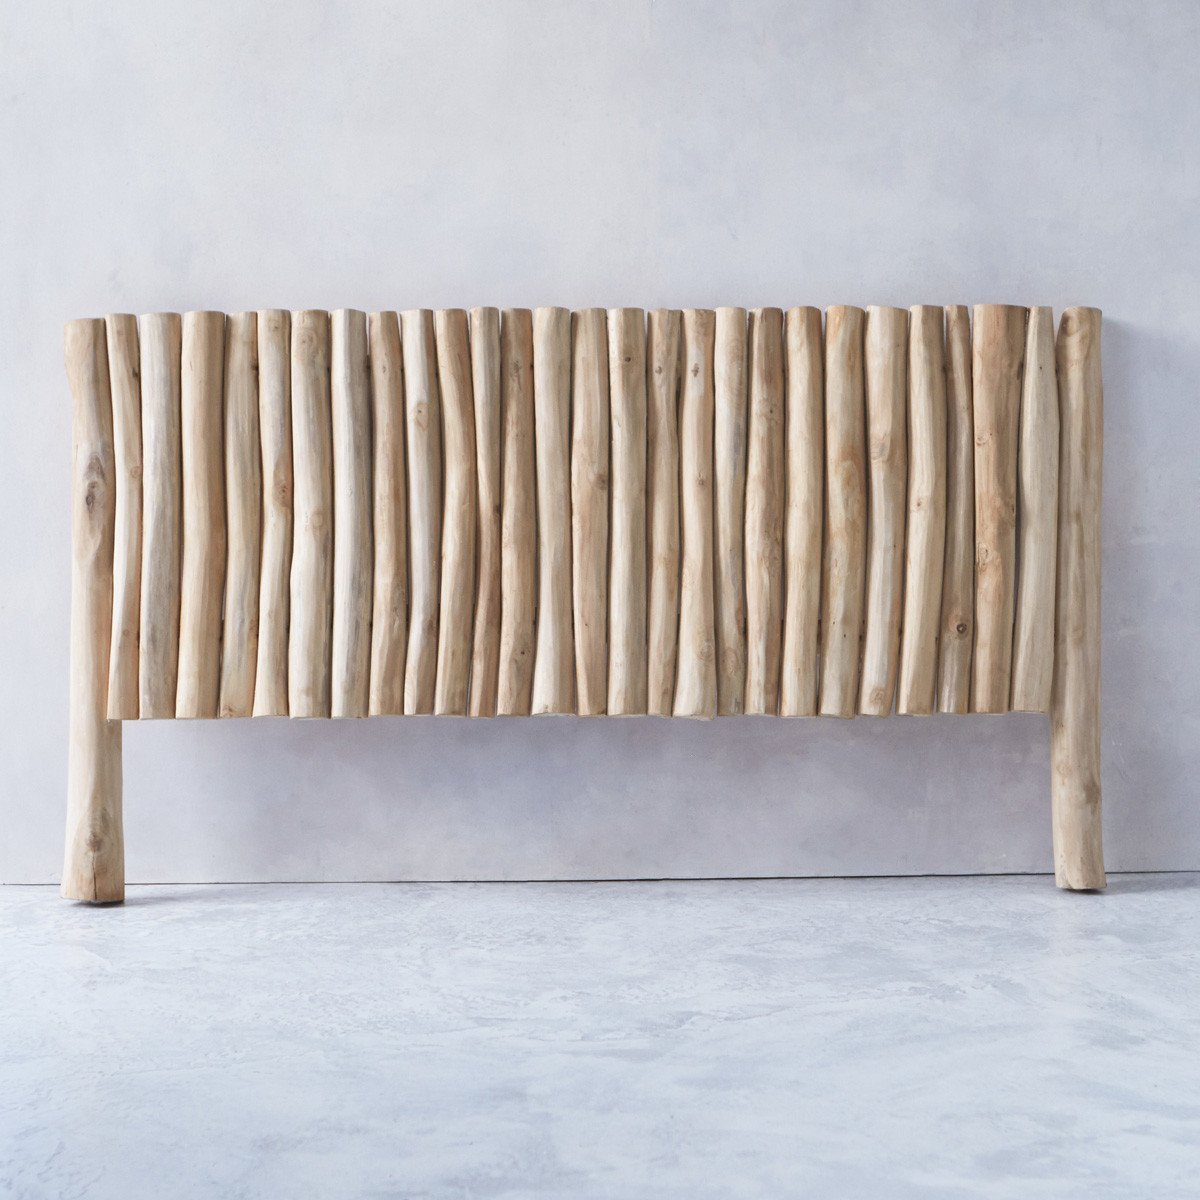 32f112618efd Solid Teak Driftwood Bed Headboard Bedrest 180cm Double Bed Natural Design:  Amazon.co.uk: Kitchen & Home